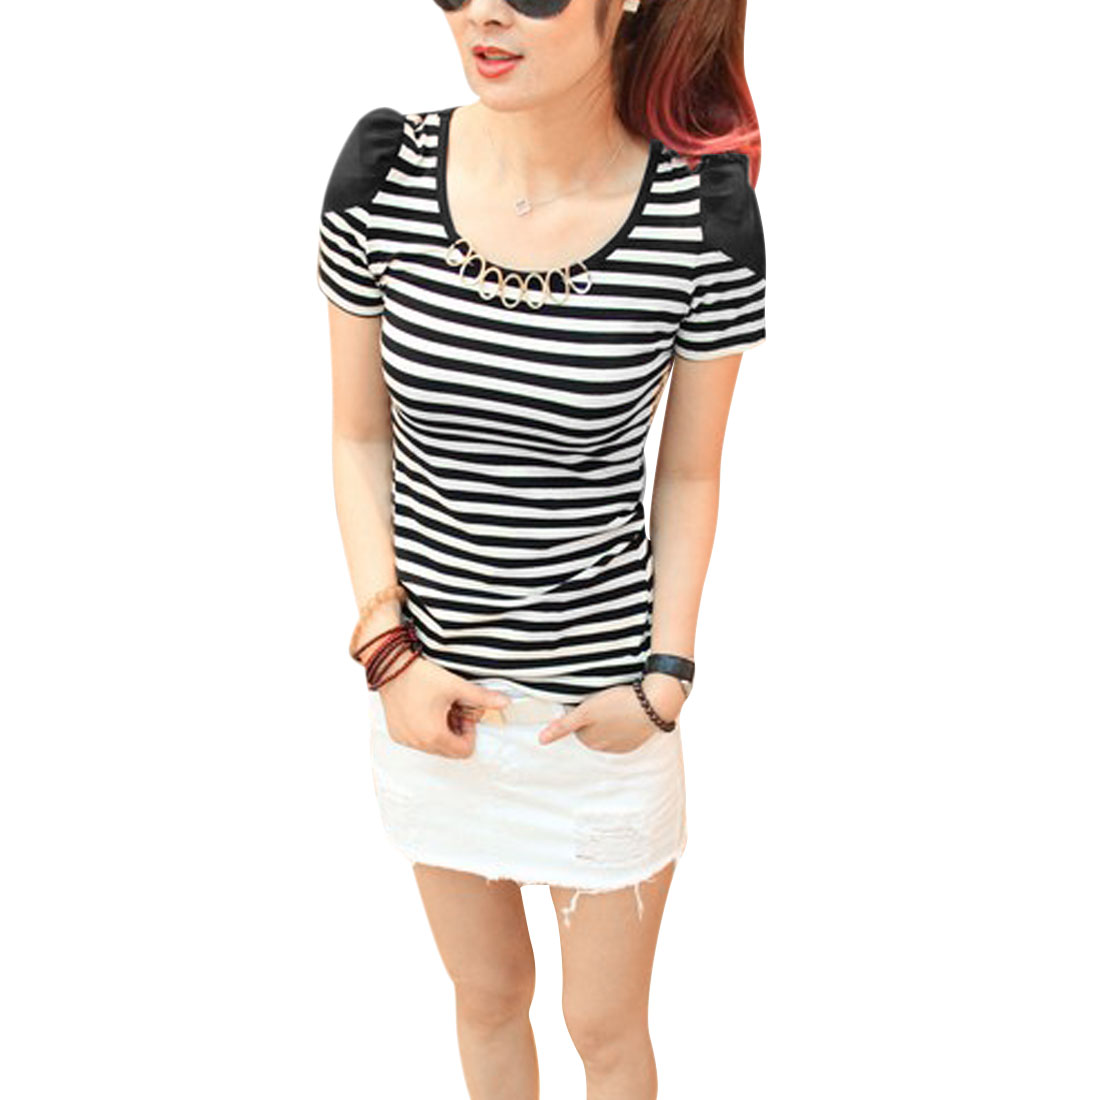 Women Round Neck Panel Chiffon Fashional Modern Shirt Black White XS